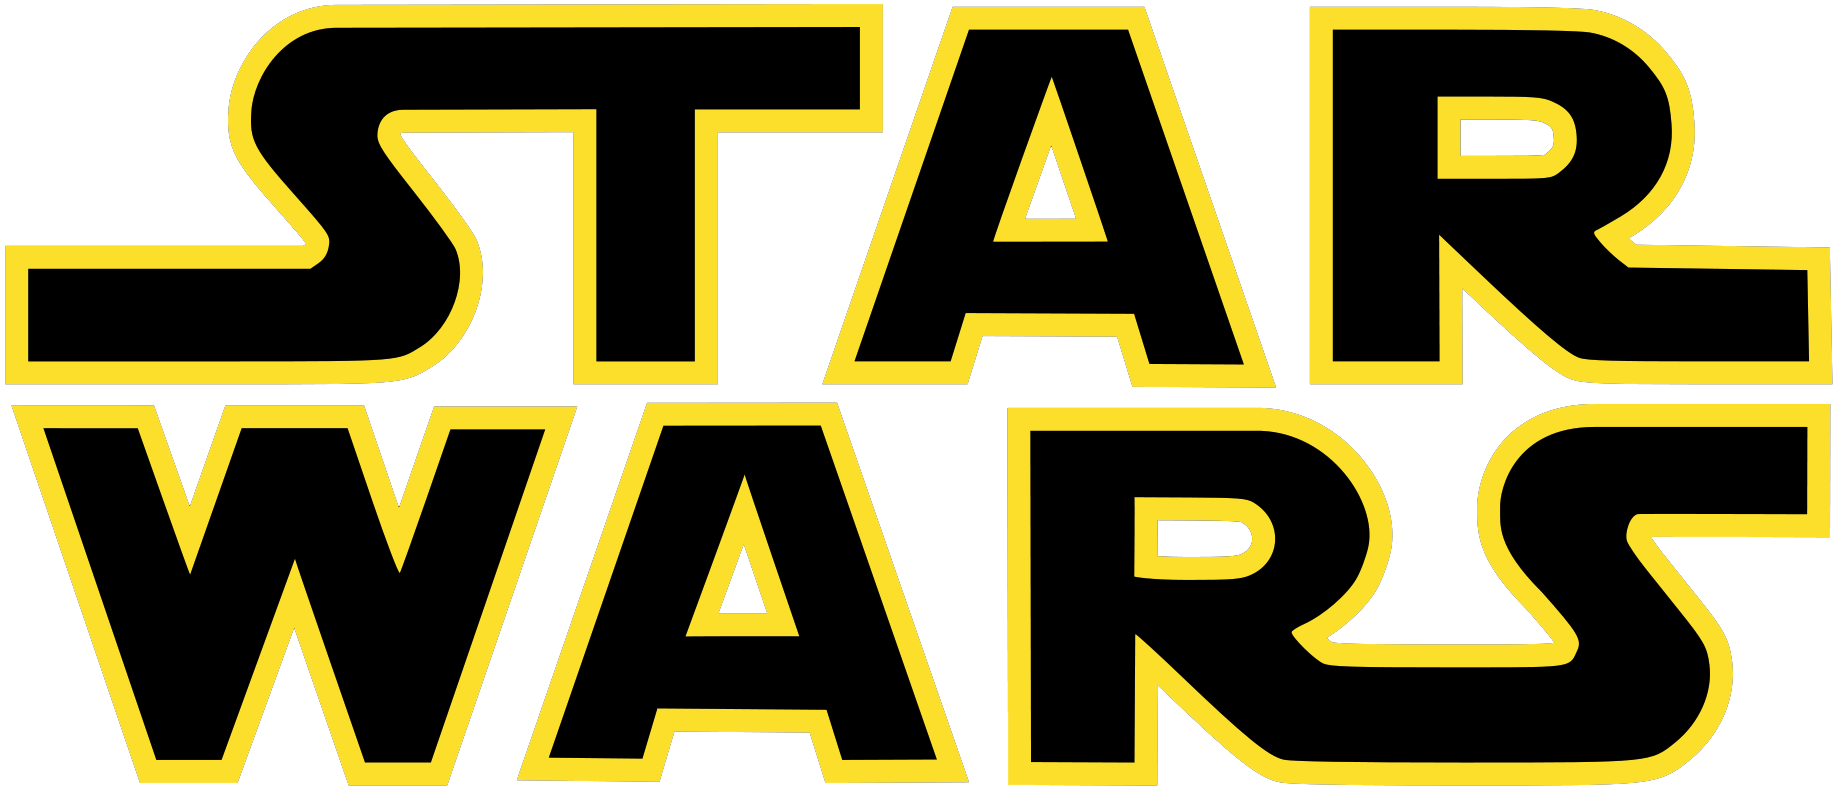 PNG Star Wars - 59881